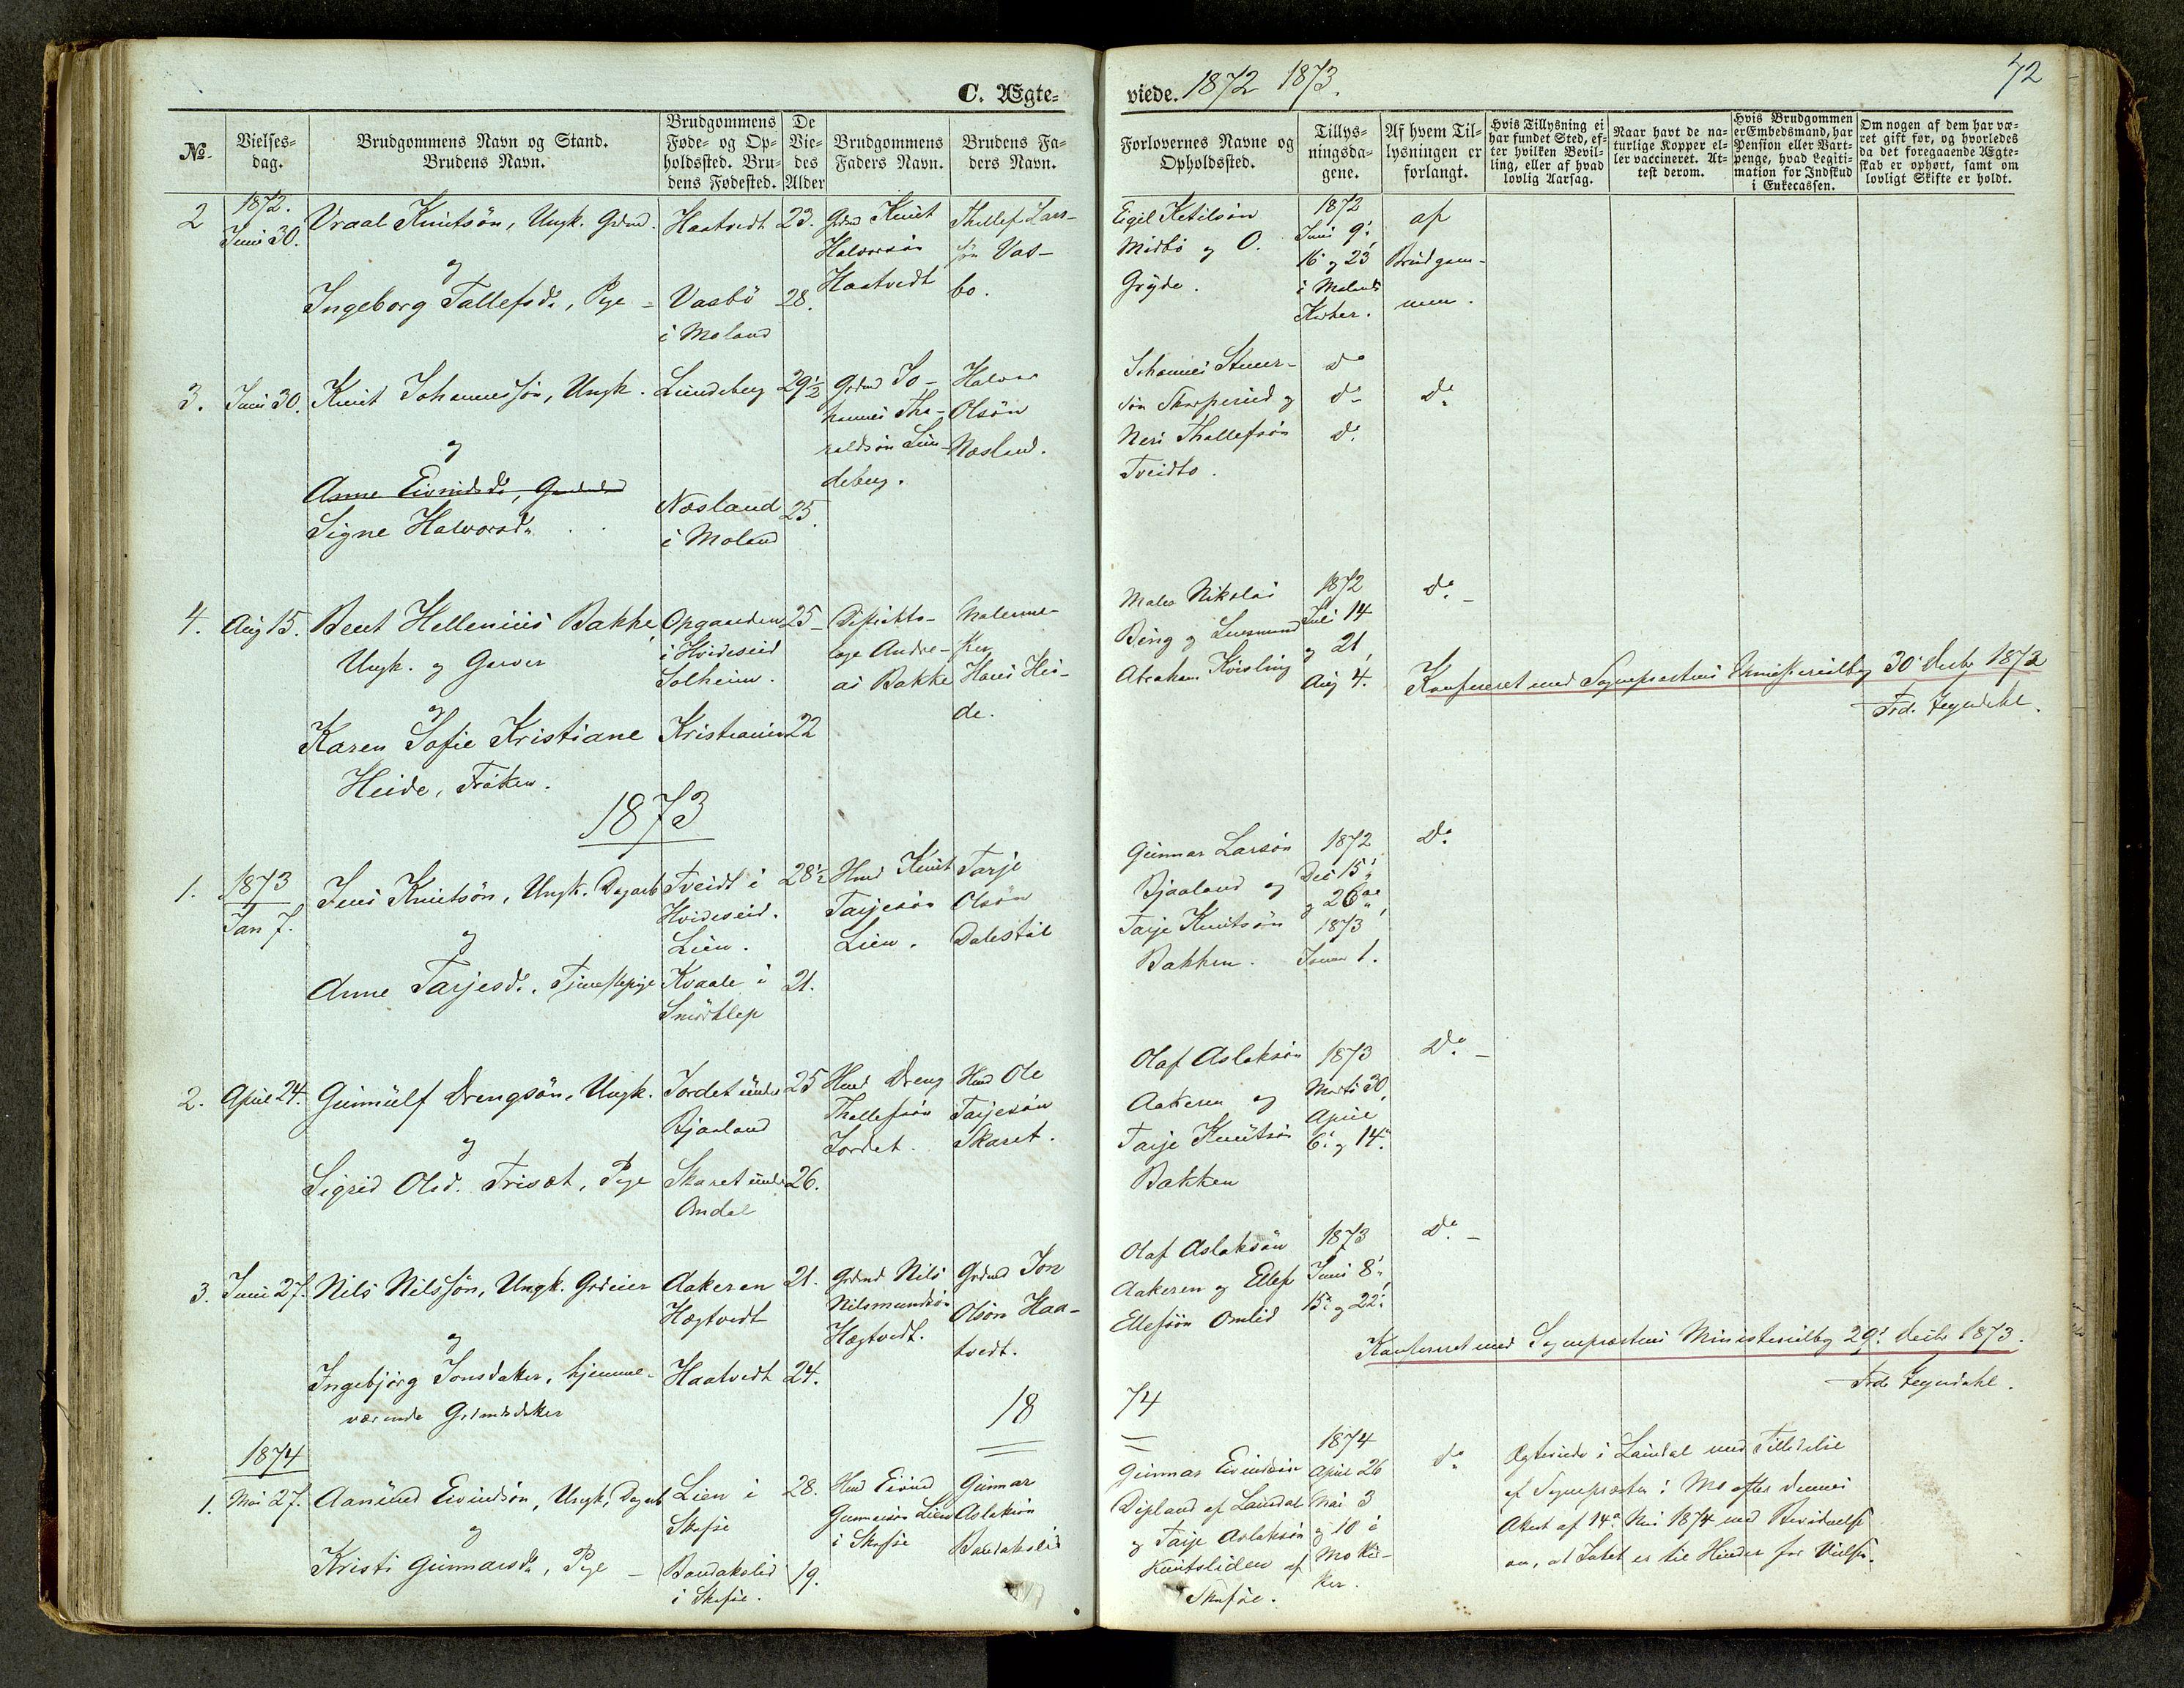 SAKO, Lårdal kirkebøker, G/Ga/L0002: Klokkerbok nr. I 2, 1861-1890, s. 72